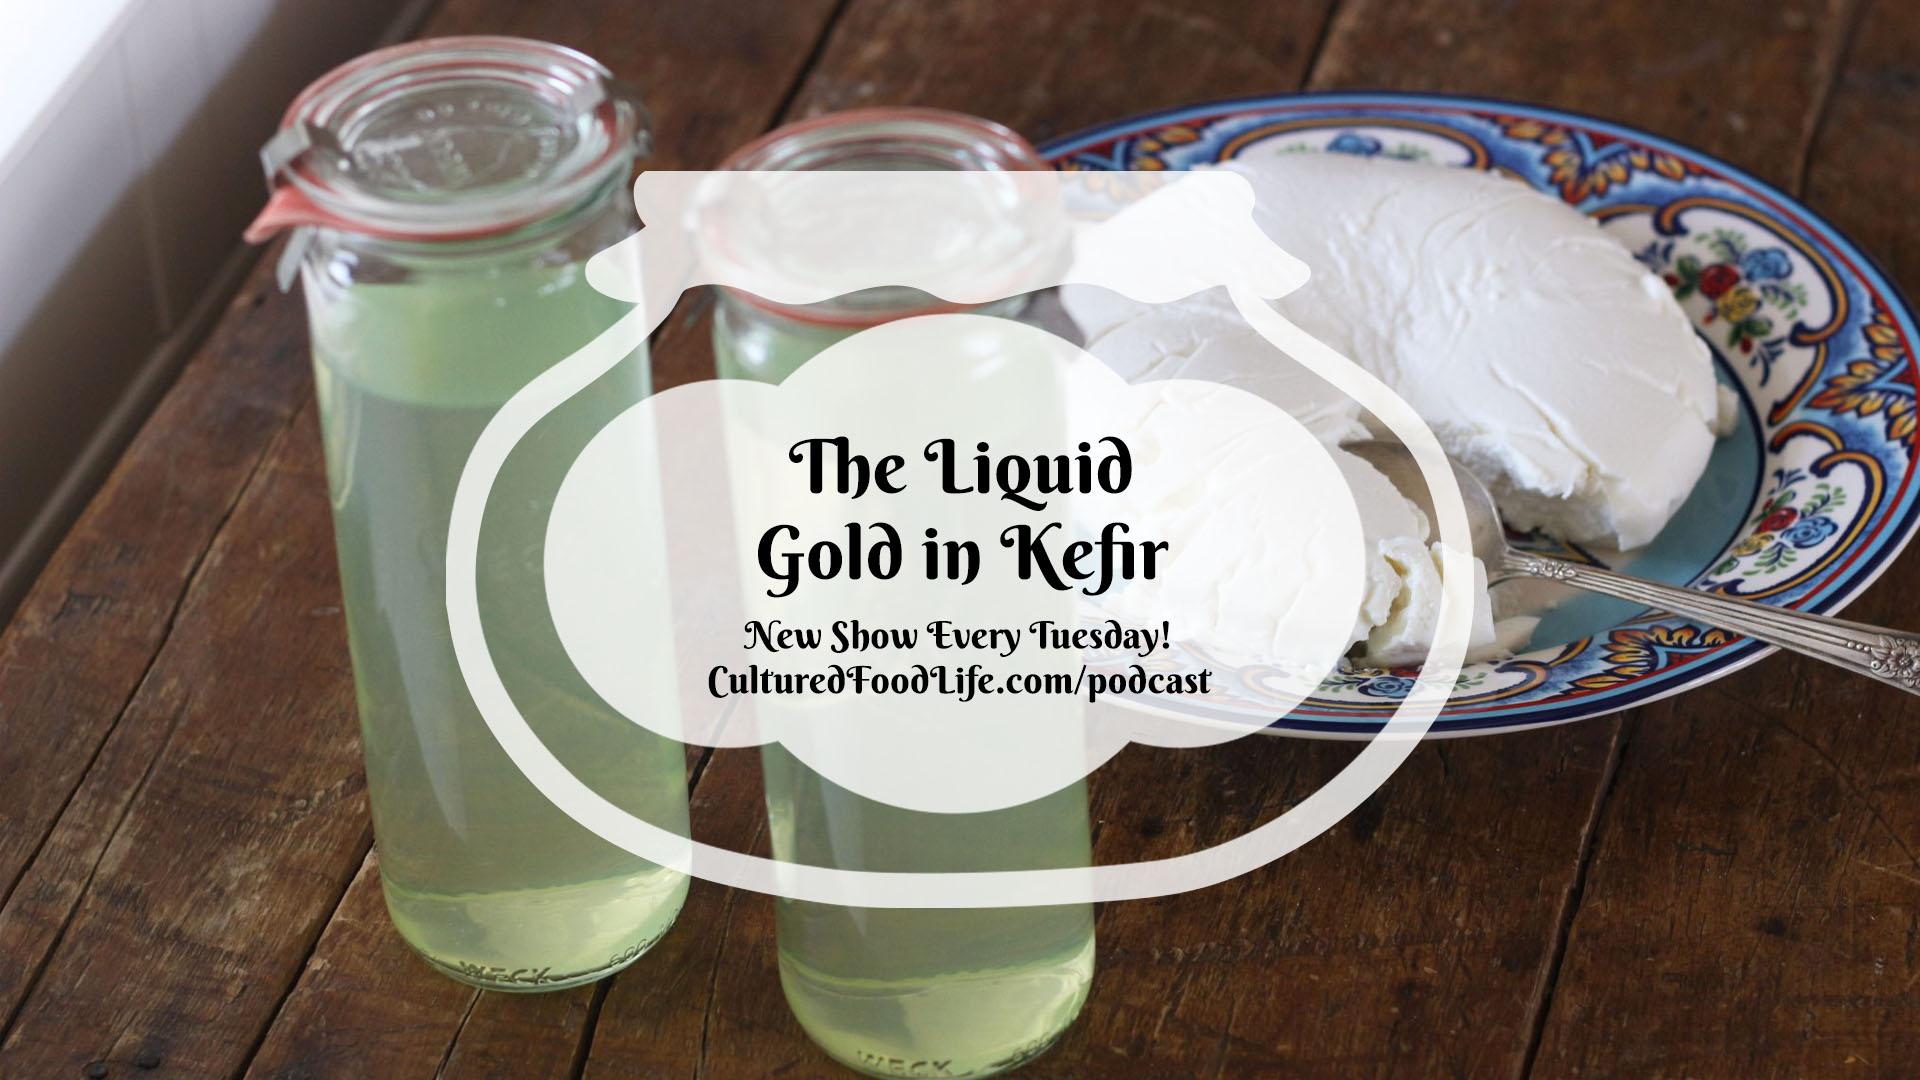 The Liquid Gold in Kefir Full